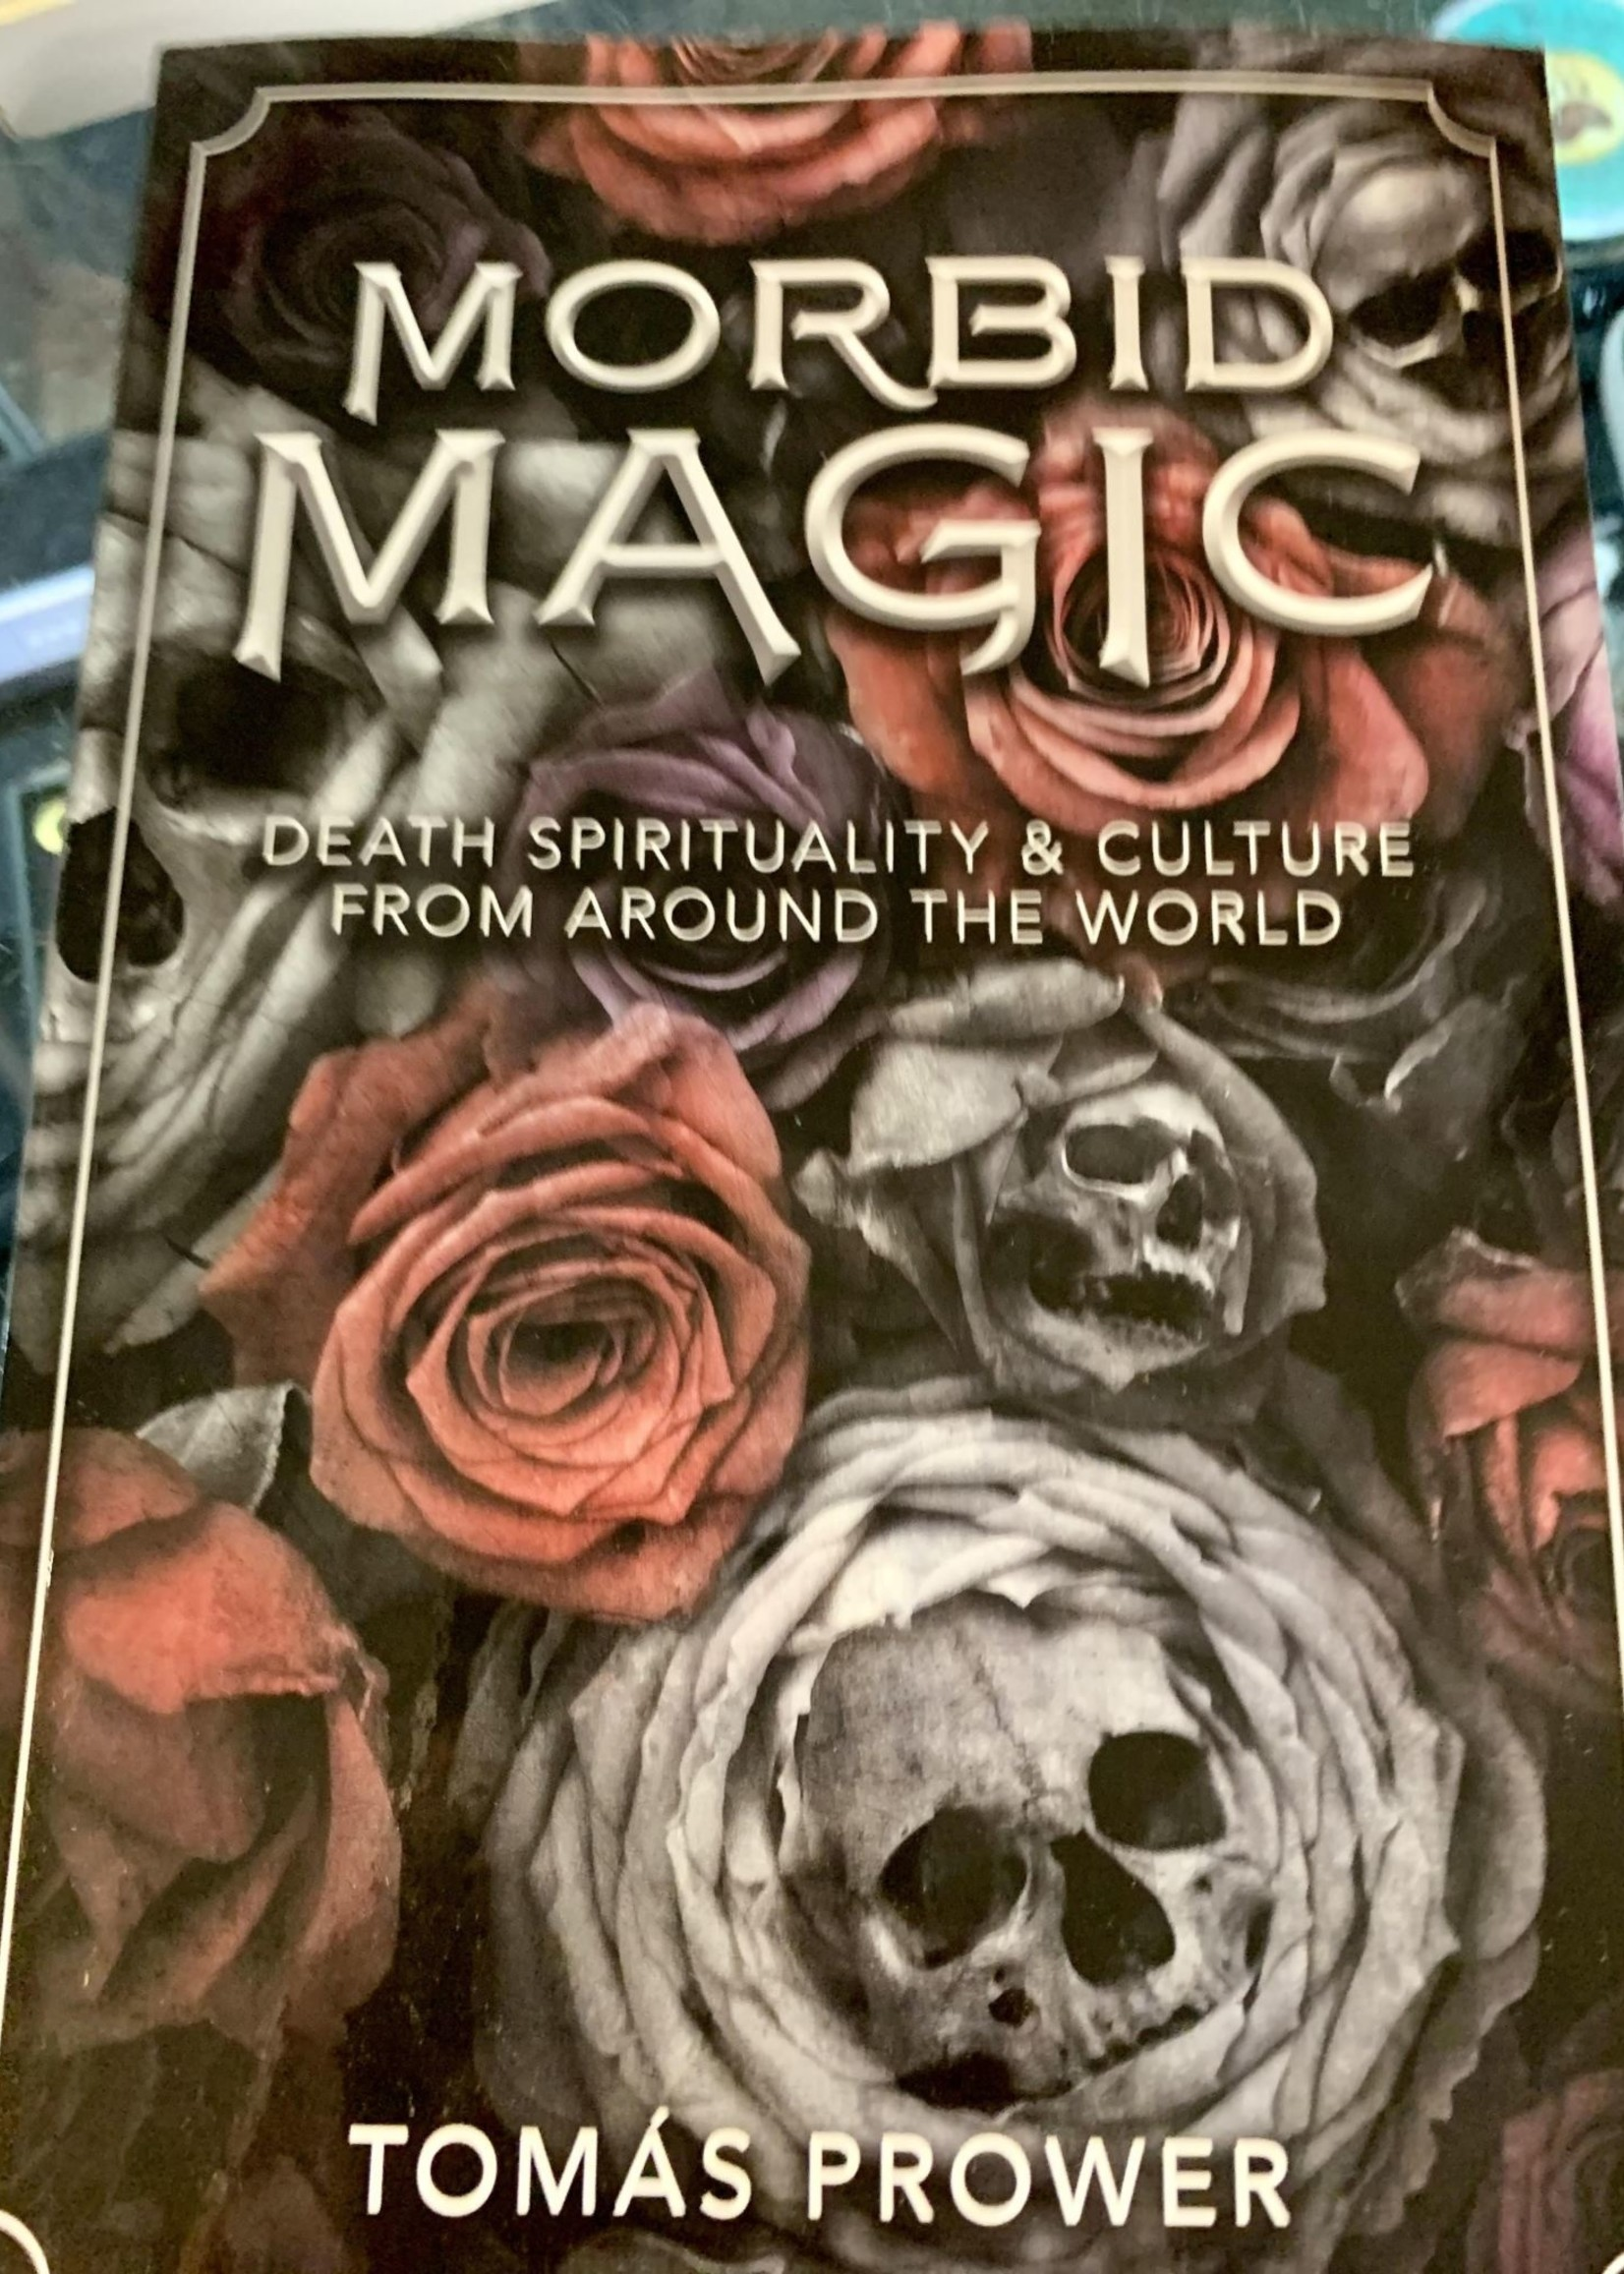 Morbid Magic - BY TOMÁS PROWER